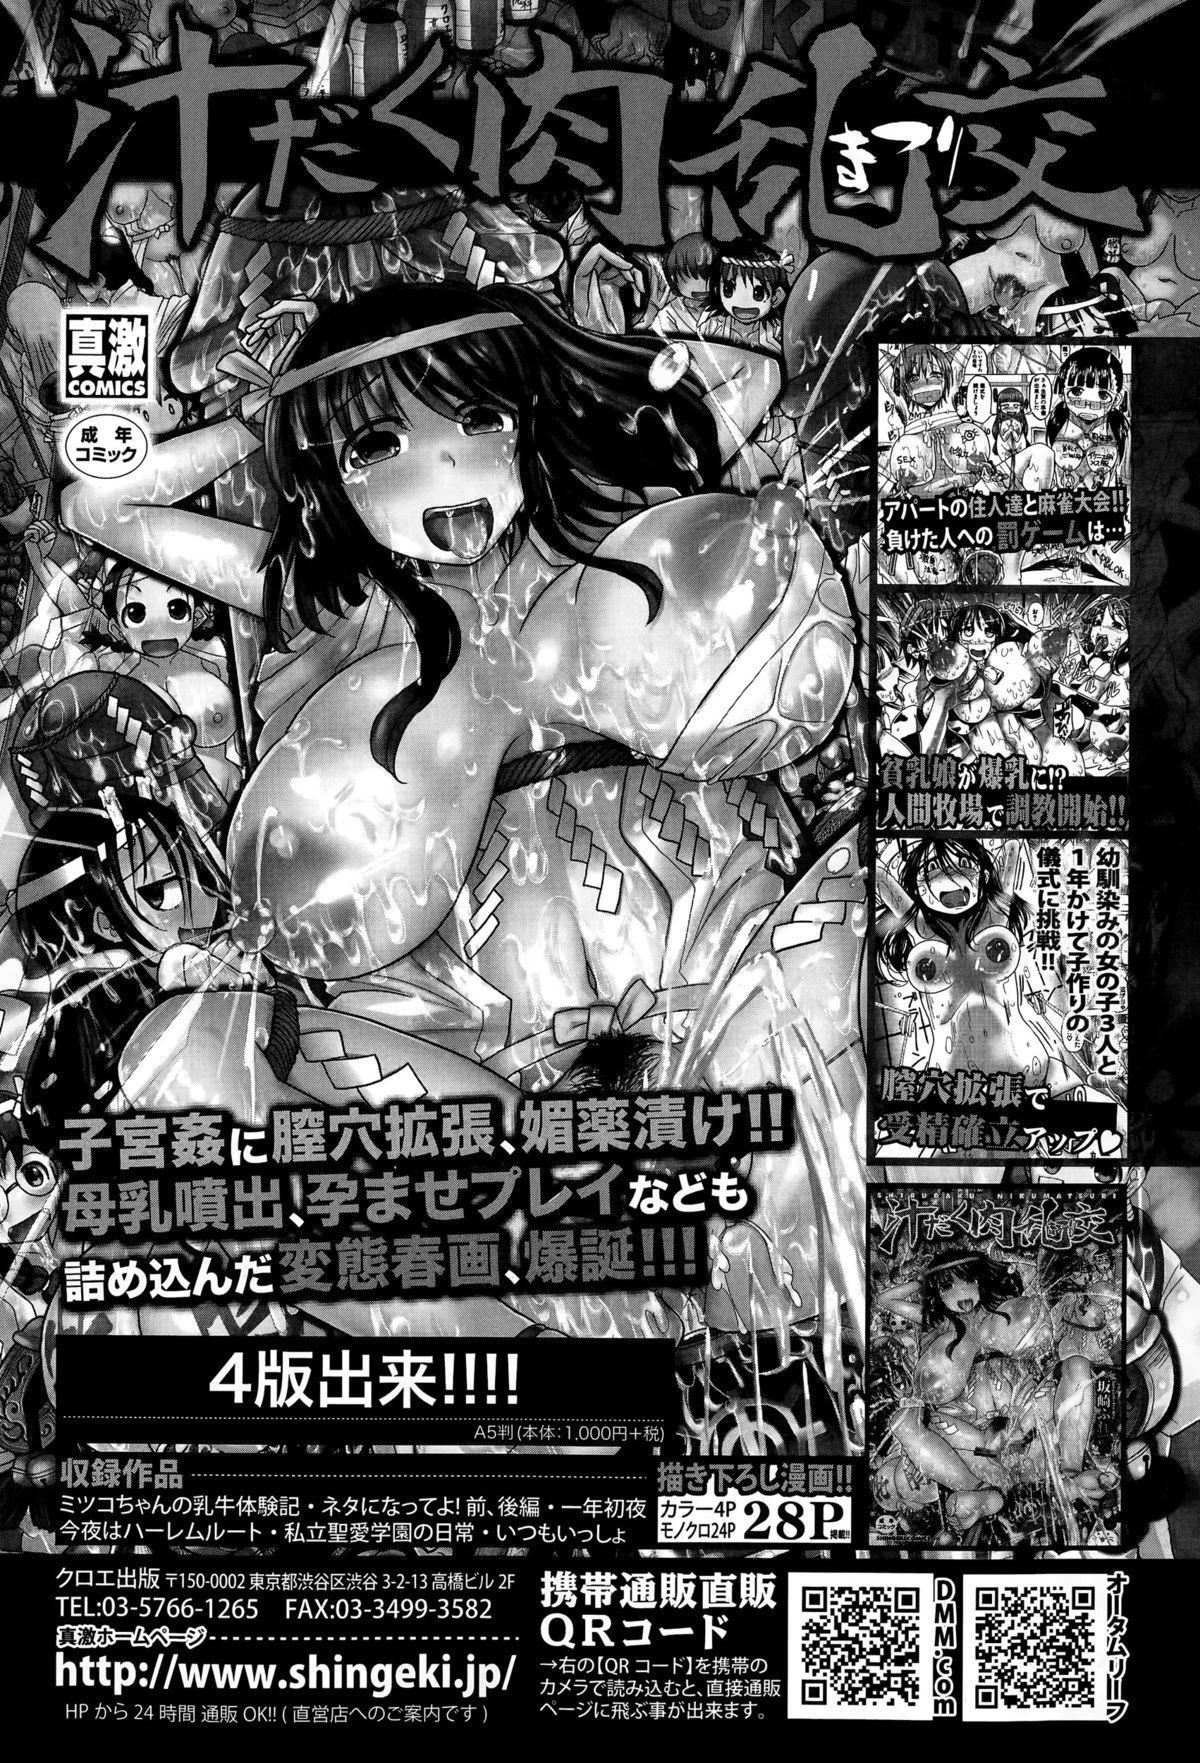 COMIC Shingeki 2015-07 266